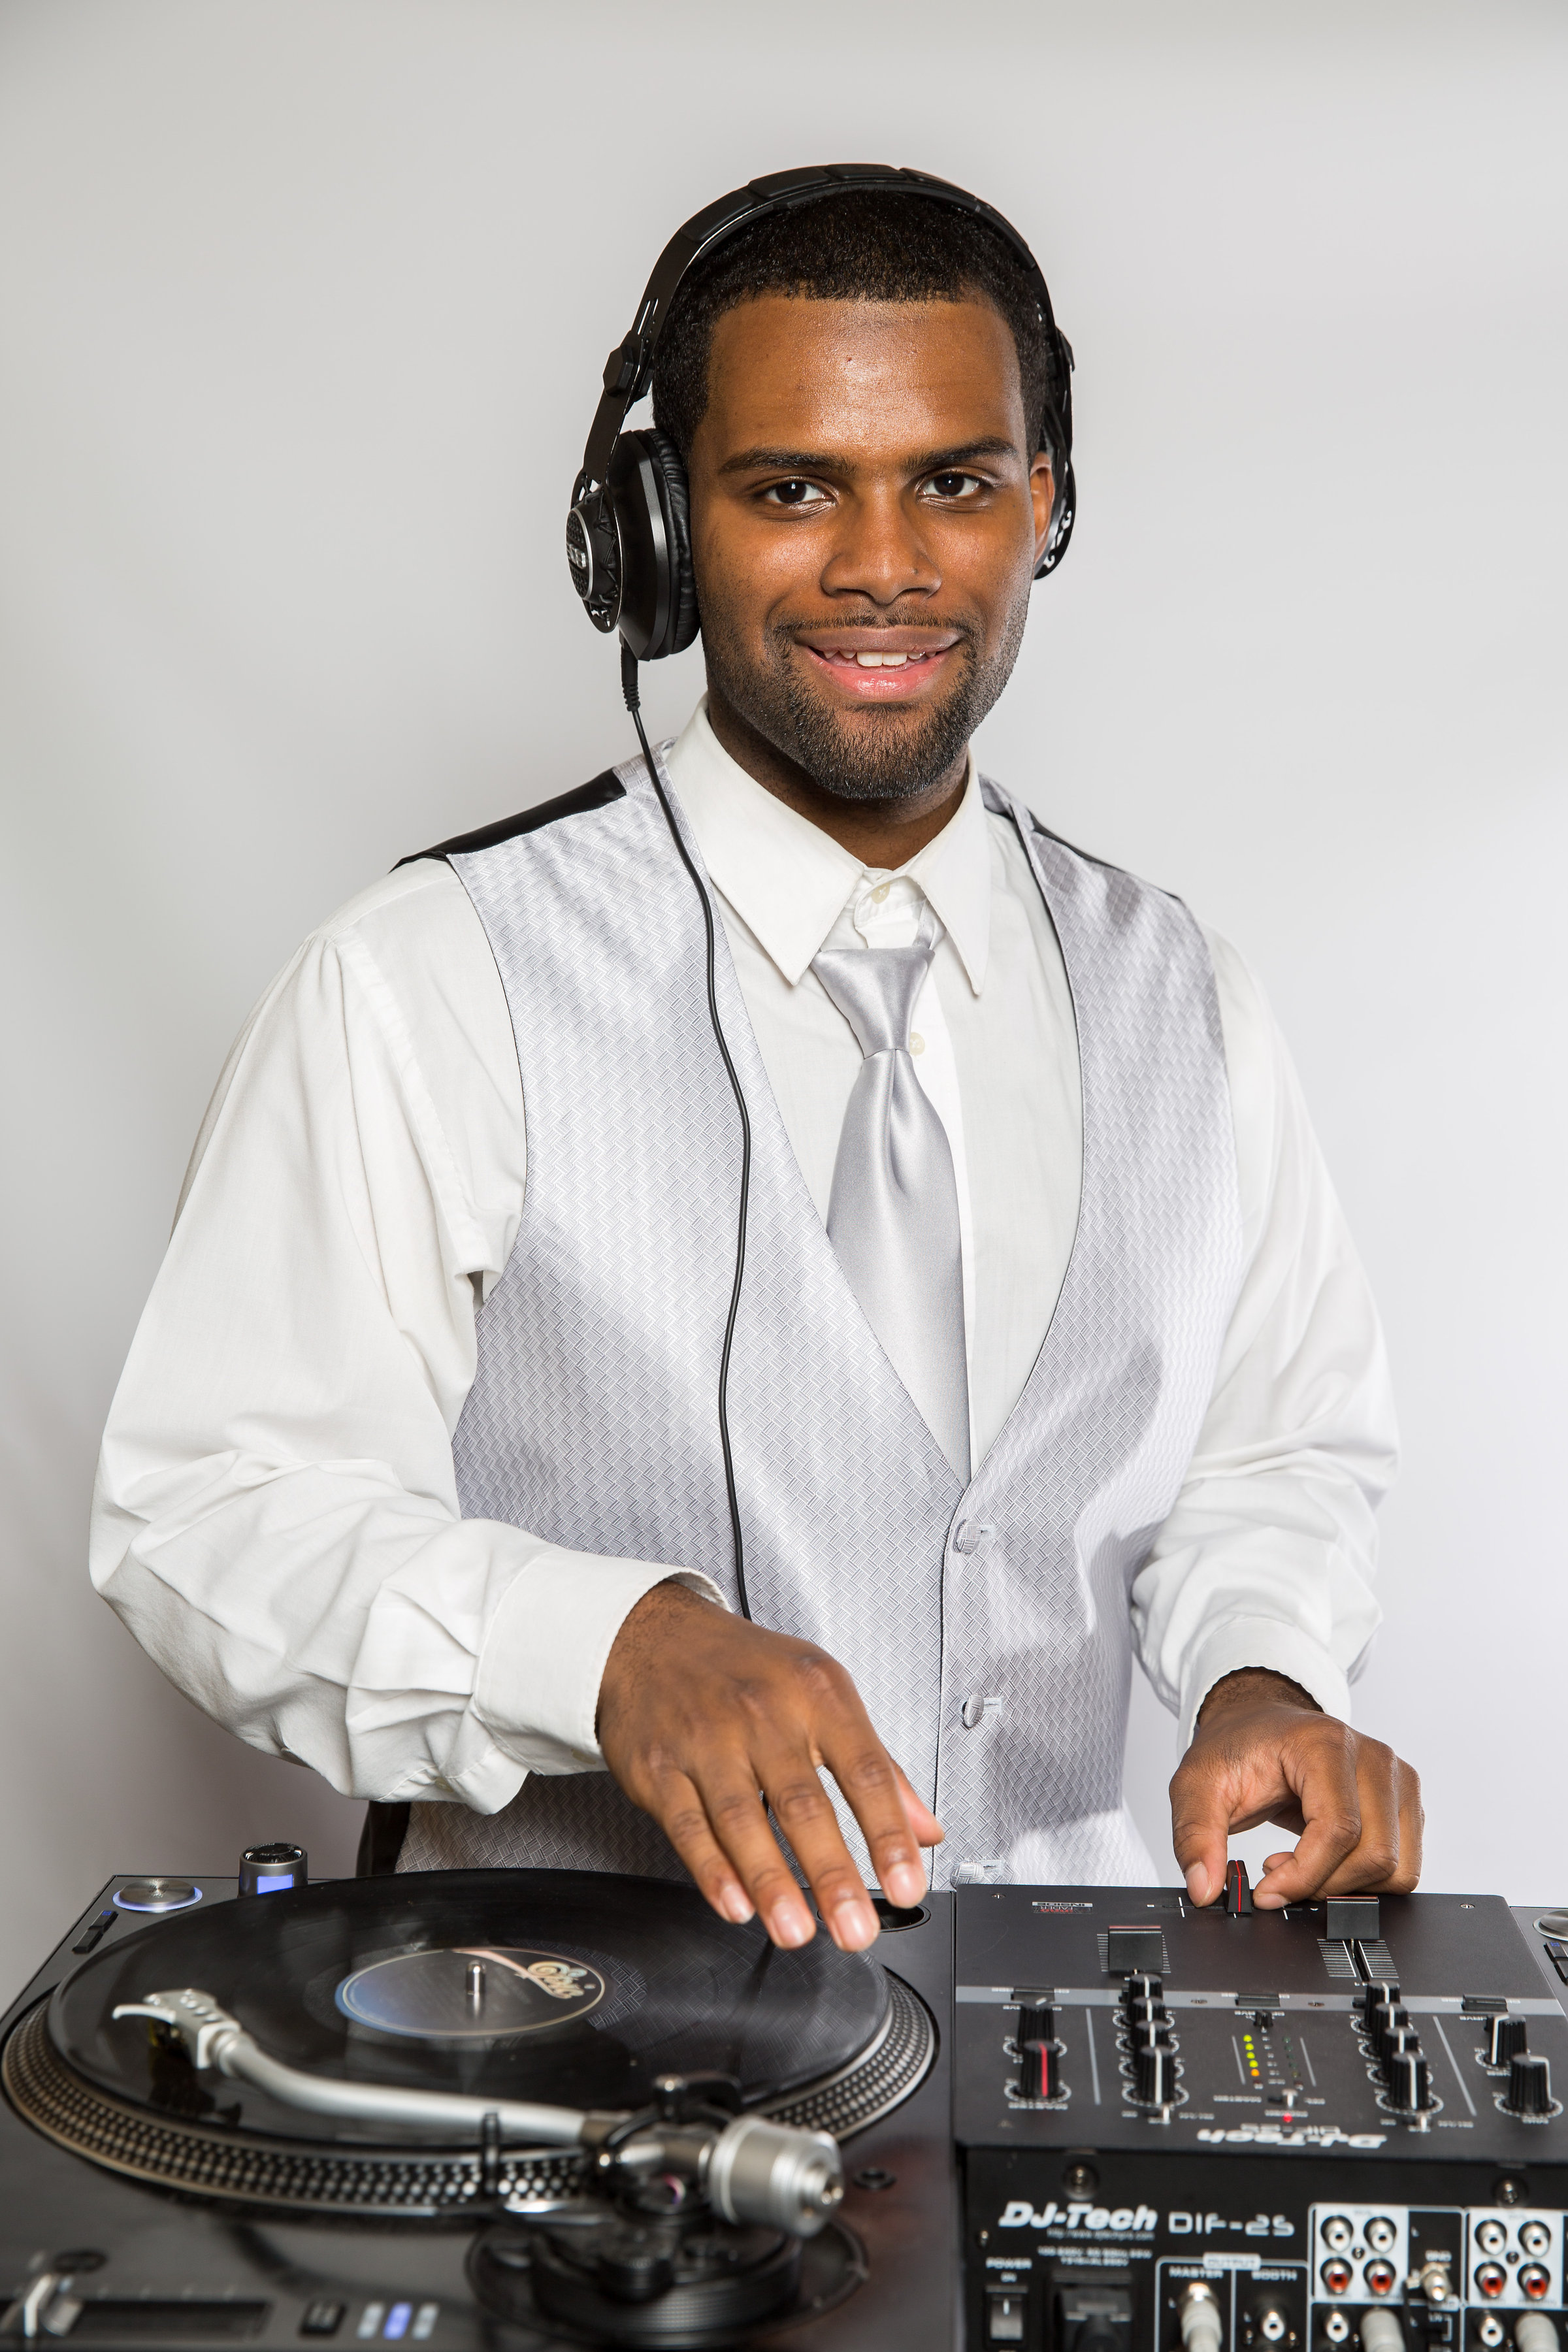 DJ Exec Headshot 01.jpg